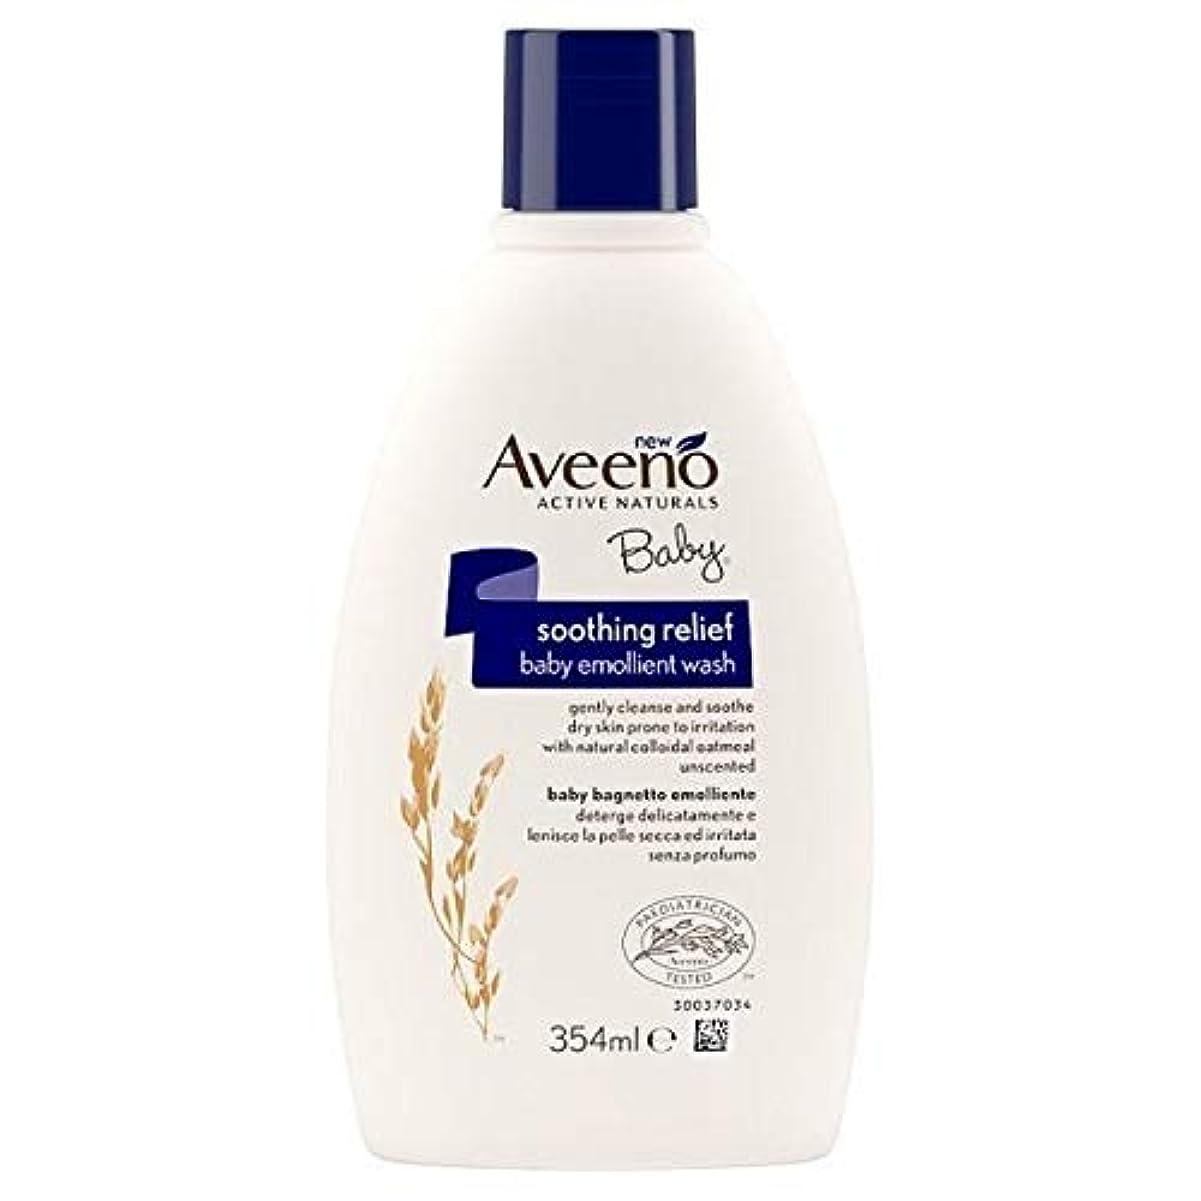 [Aveeno] Aveeno赤ちゃんなだめるような救済エモリエントウォッシュ354ミリリットル - Aveeno Baby Soothing Relief Emollient Wash 354ml [並行輸入品]